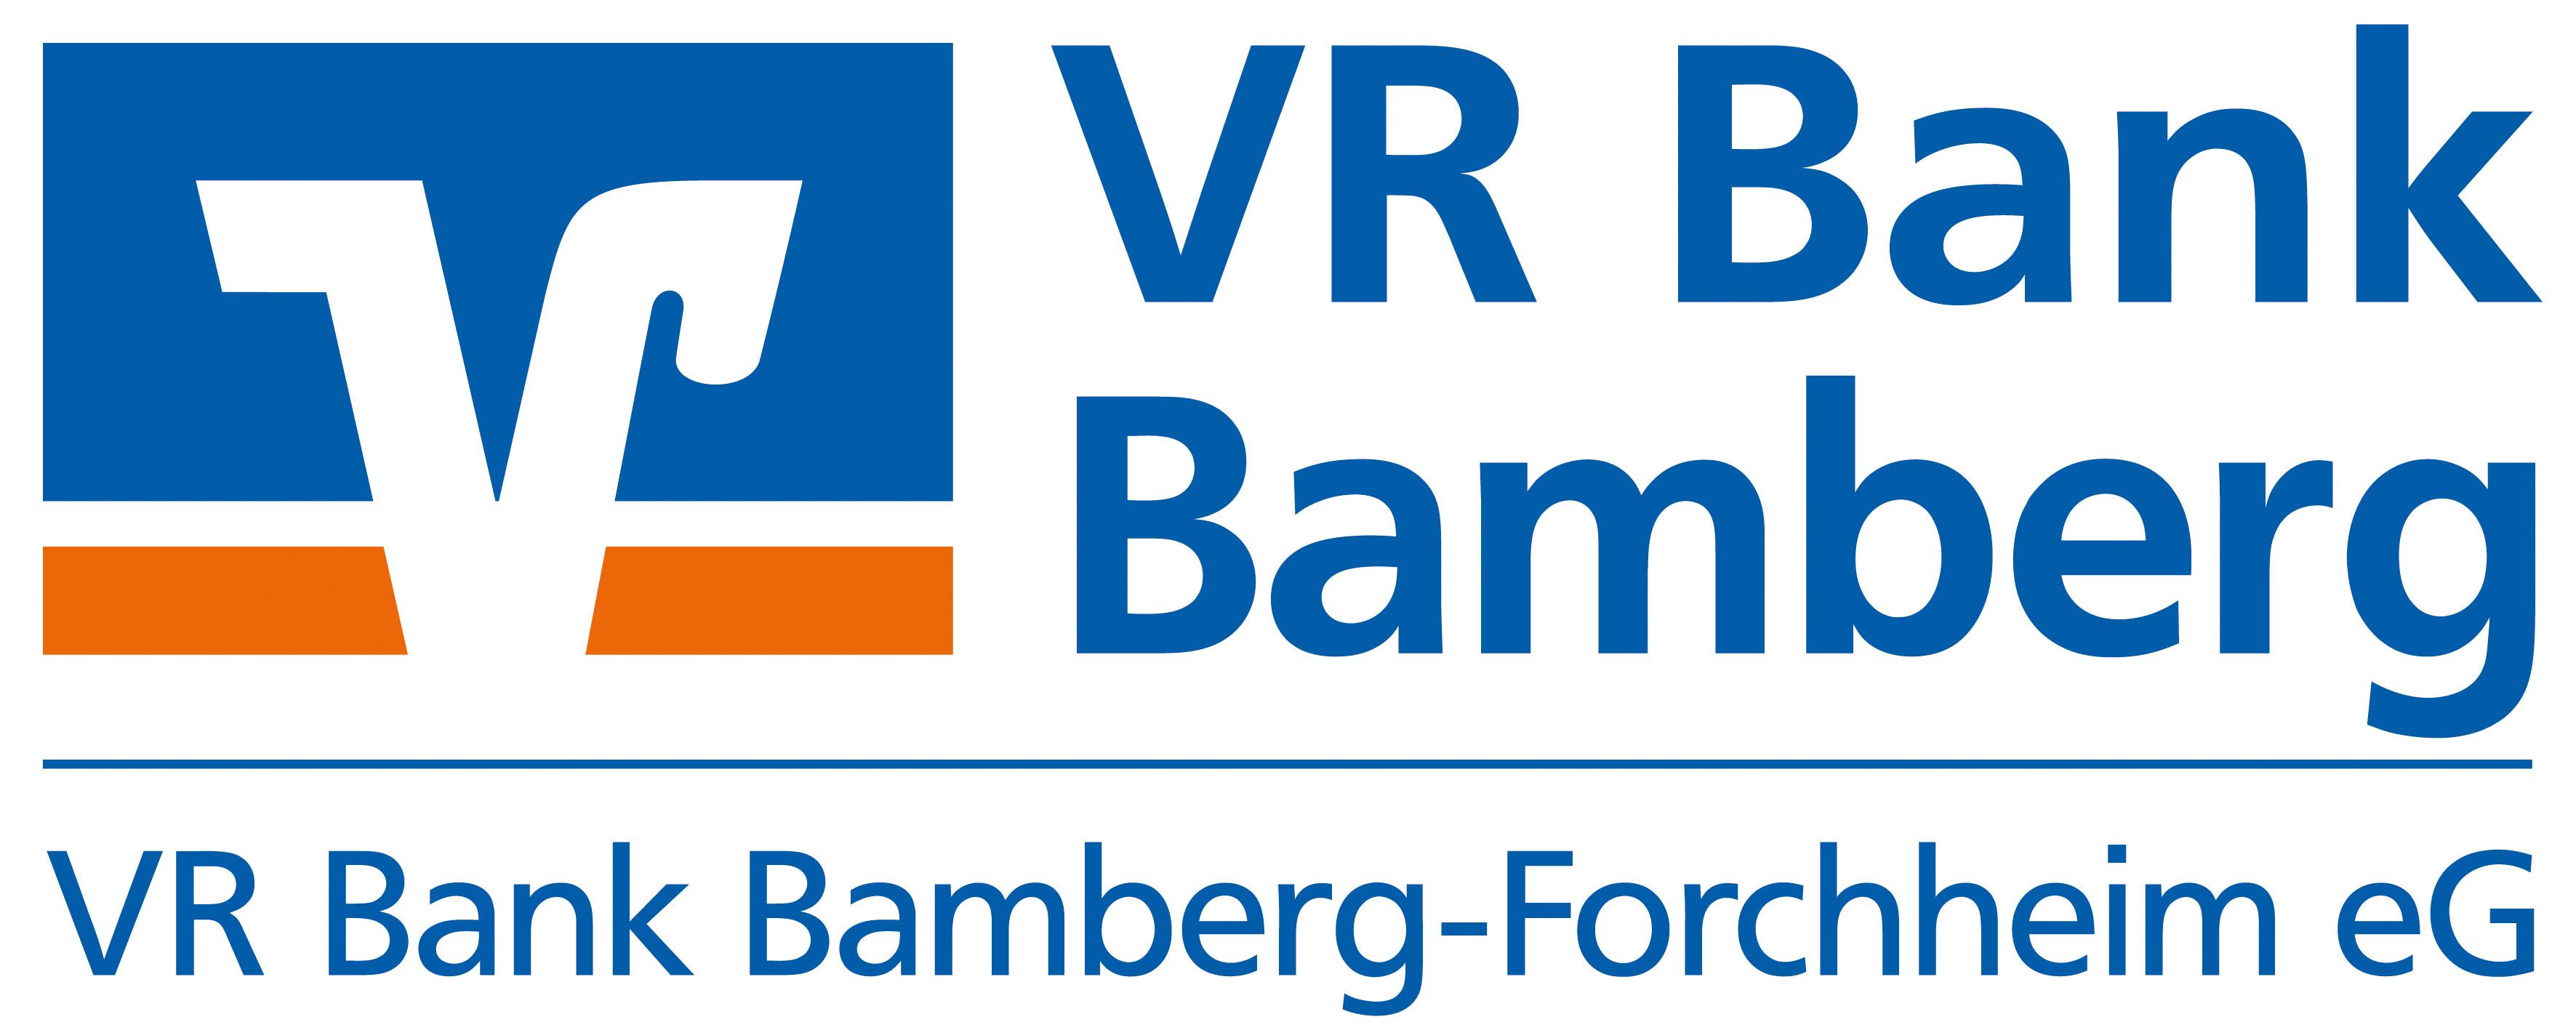 VR Bank Bamberg, Geldautomat ERTL-Shopping Center